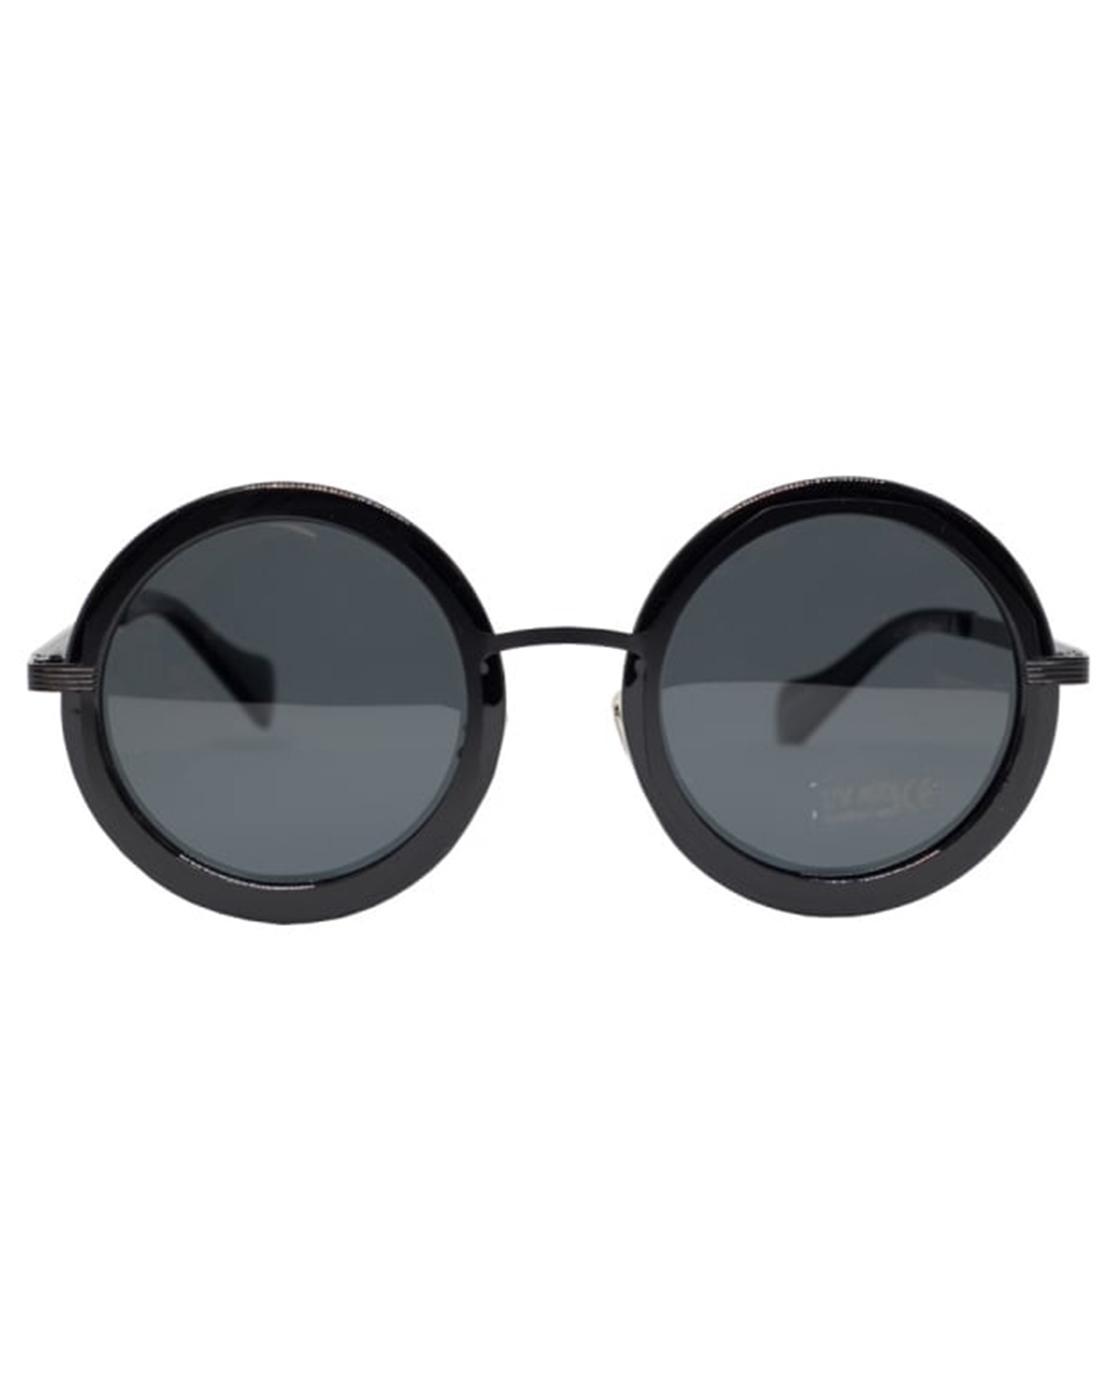 Grace BRIGHT & BEAUTIFUL Womens 60s Sunglasses